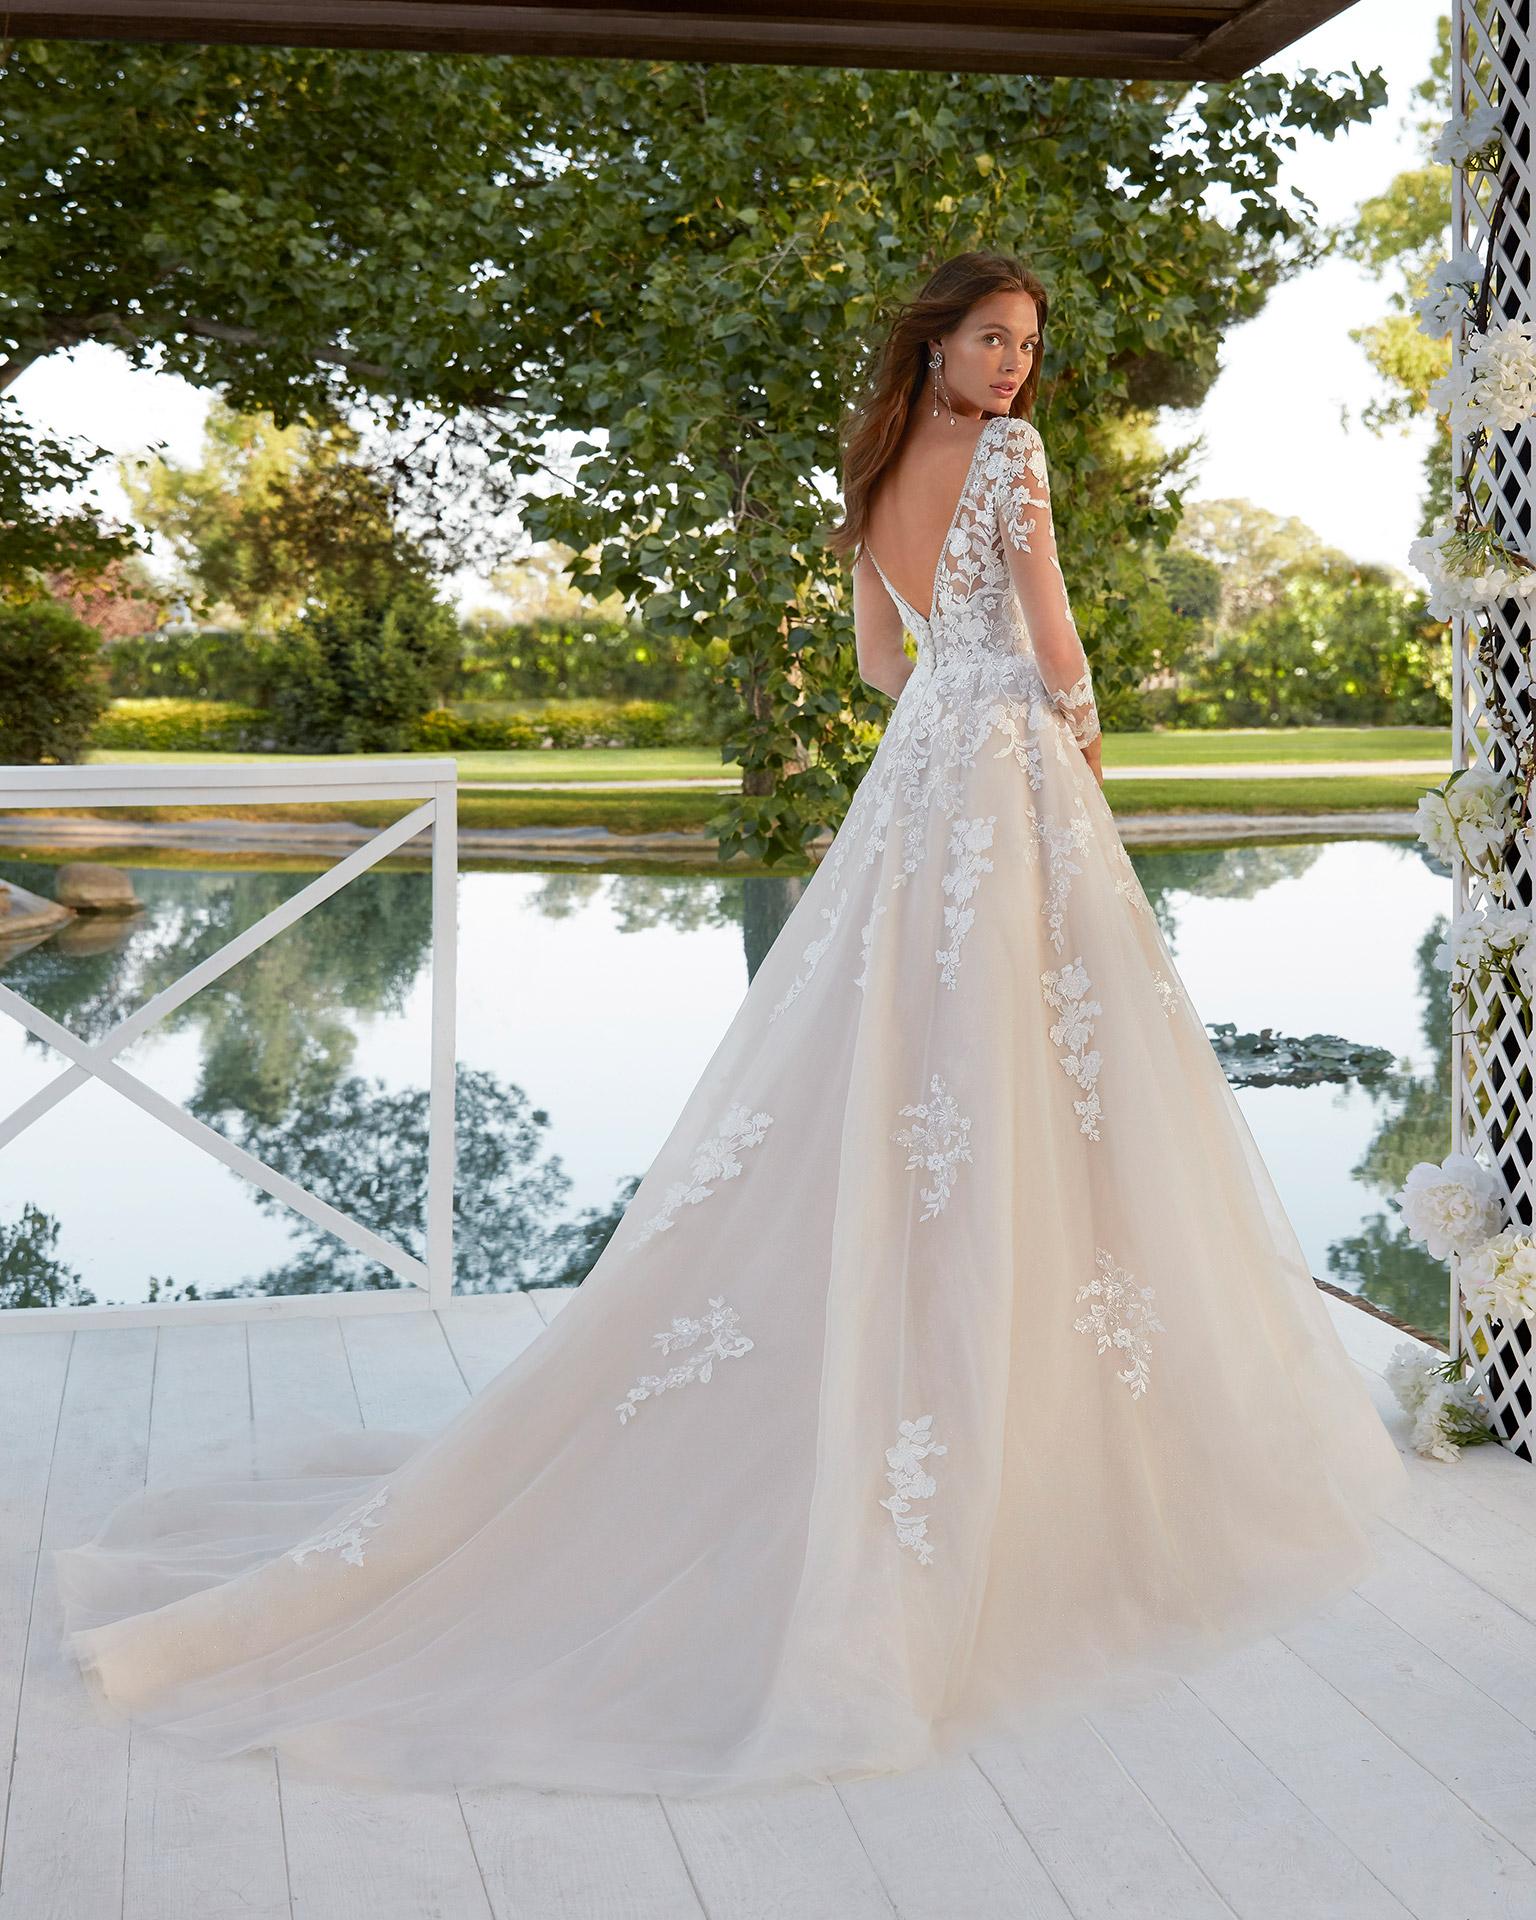 Casit Bridal 2021 Aire Royale Collection